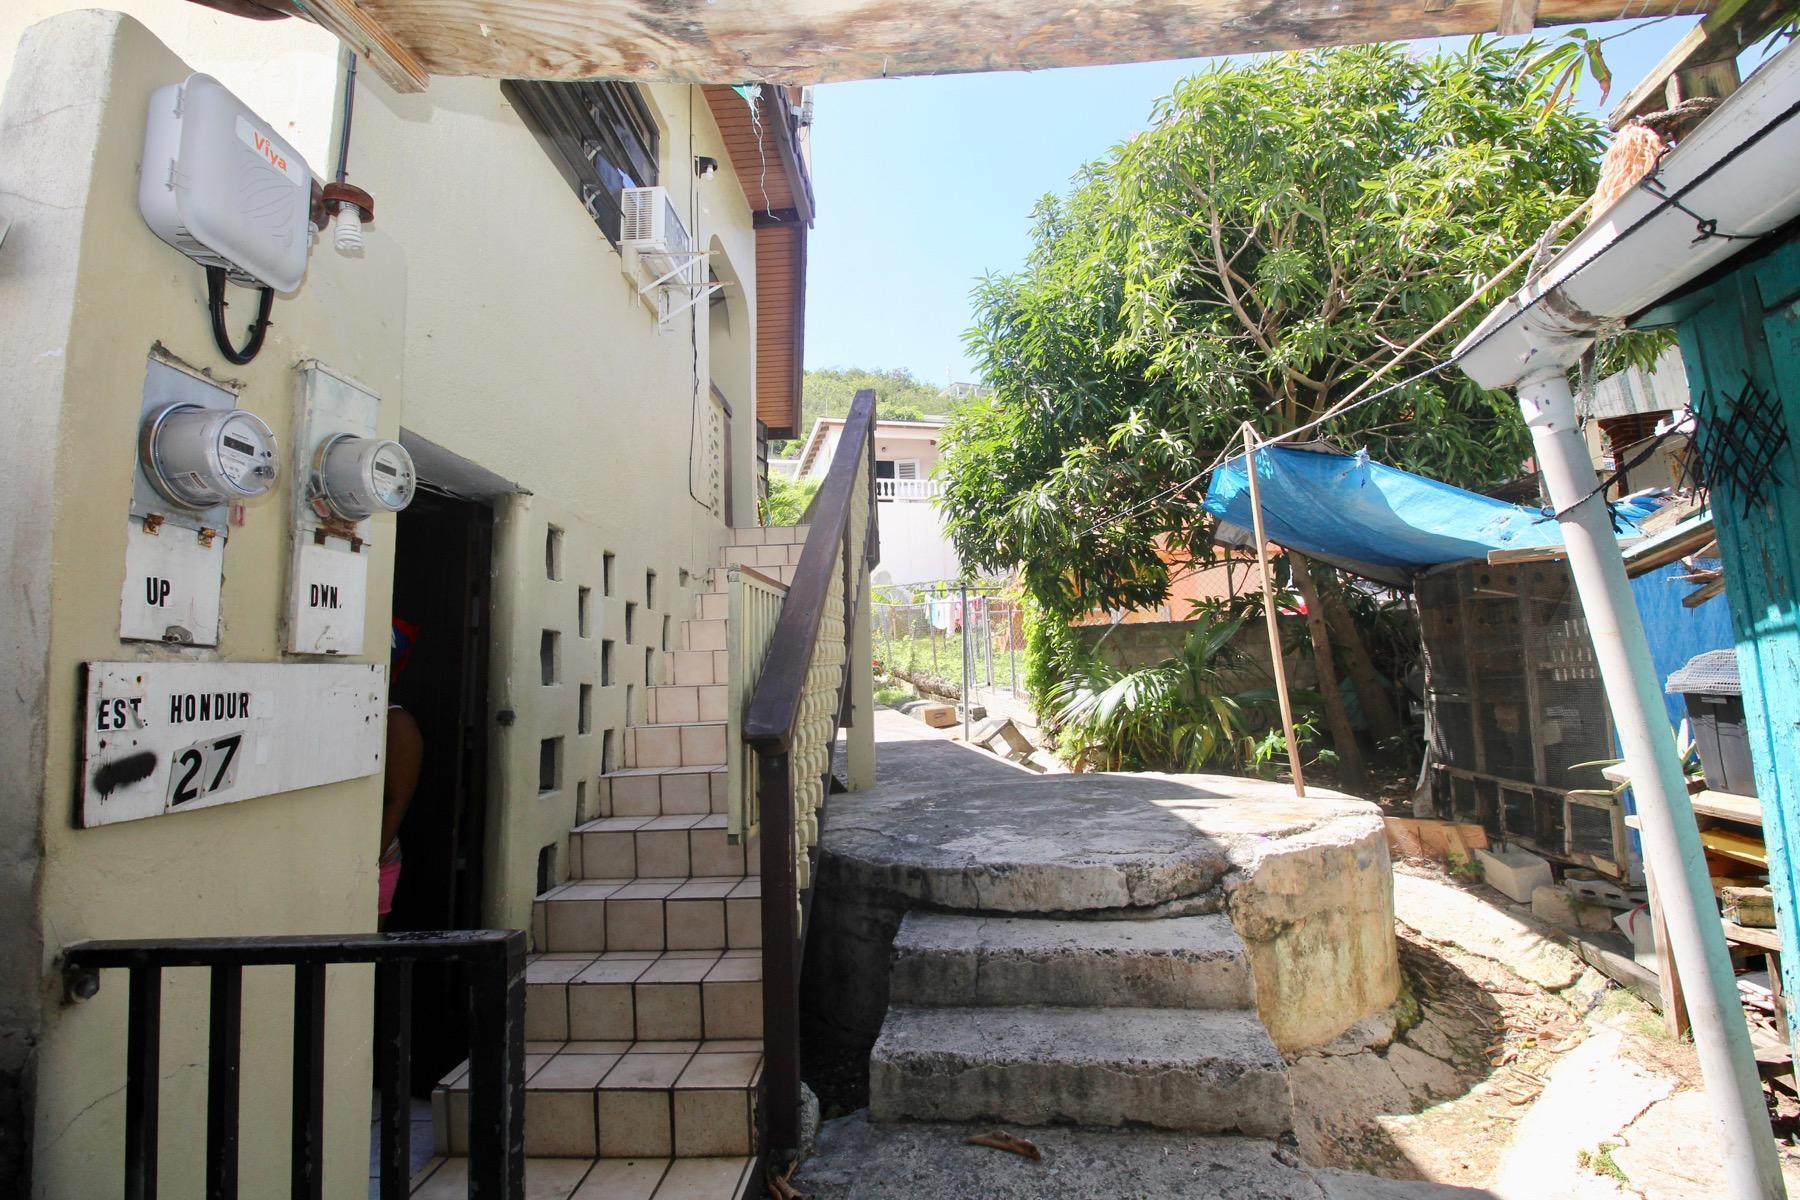 RE/MAX real estate, US Virgin Islands, Honduras Estate, Price Reduced  Residential  Honduras KPS